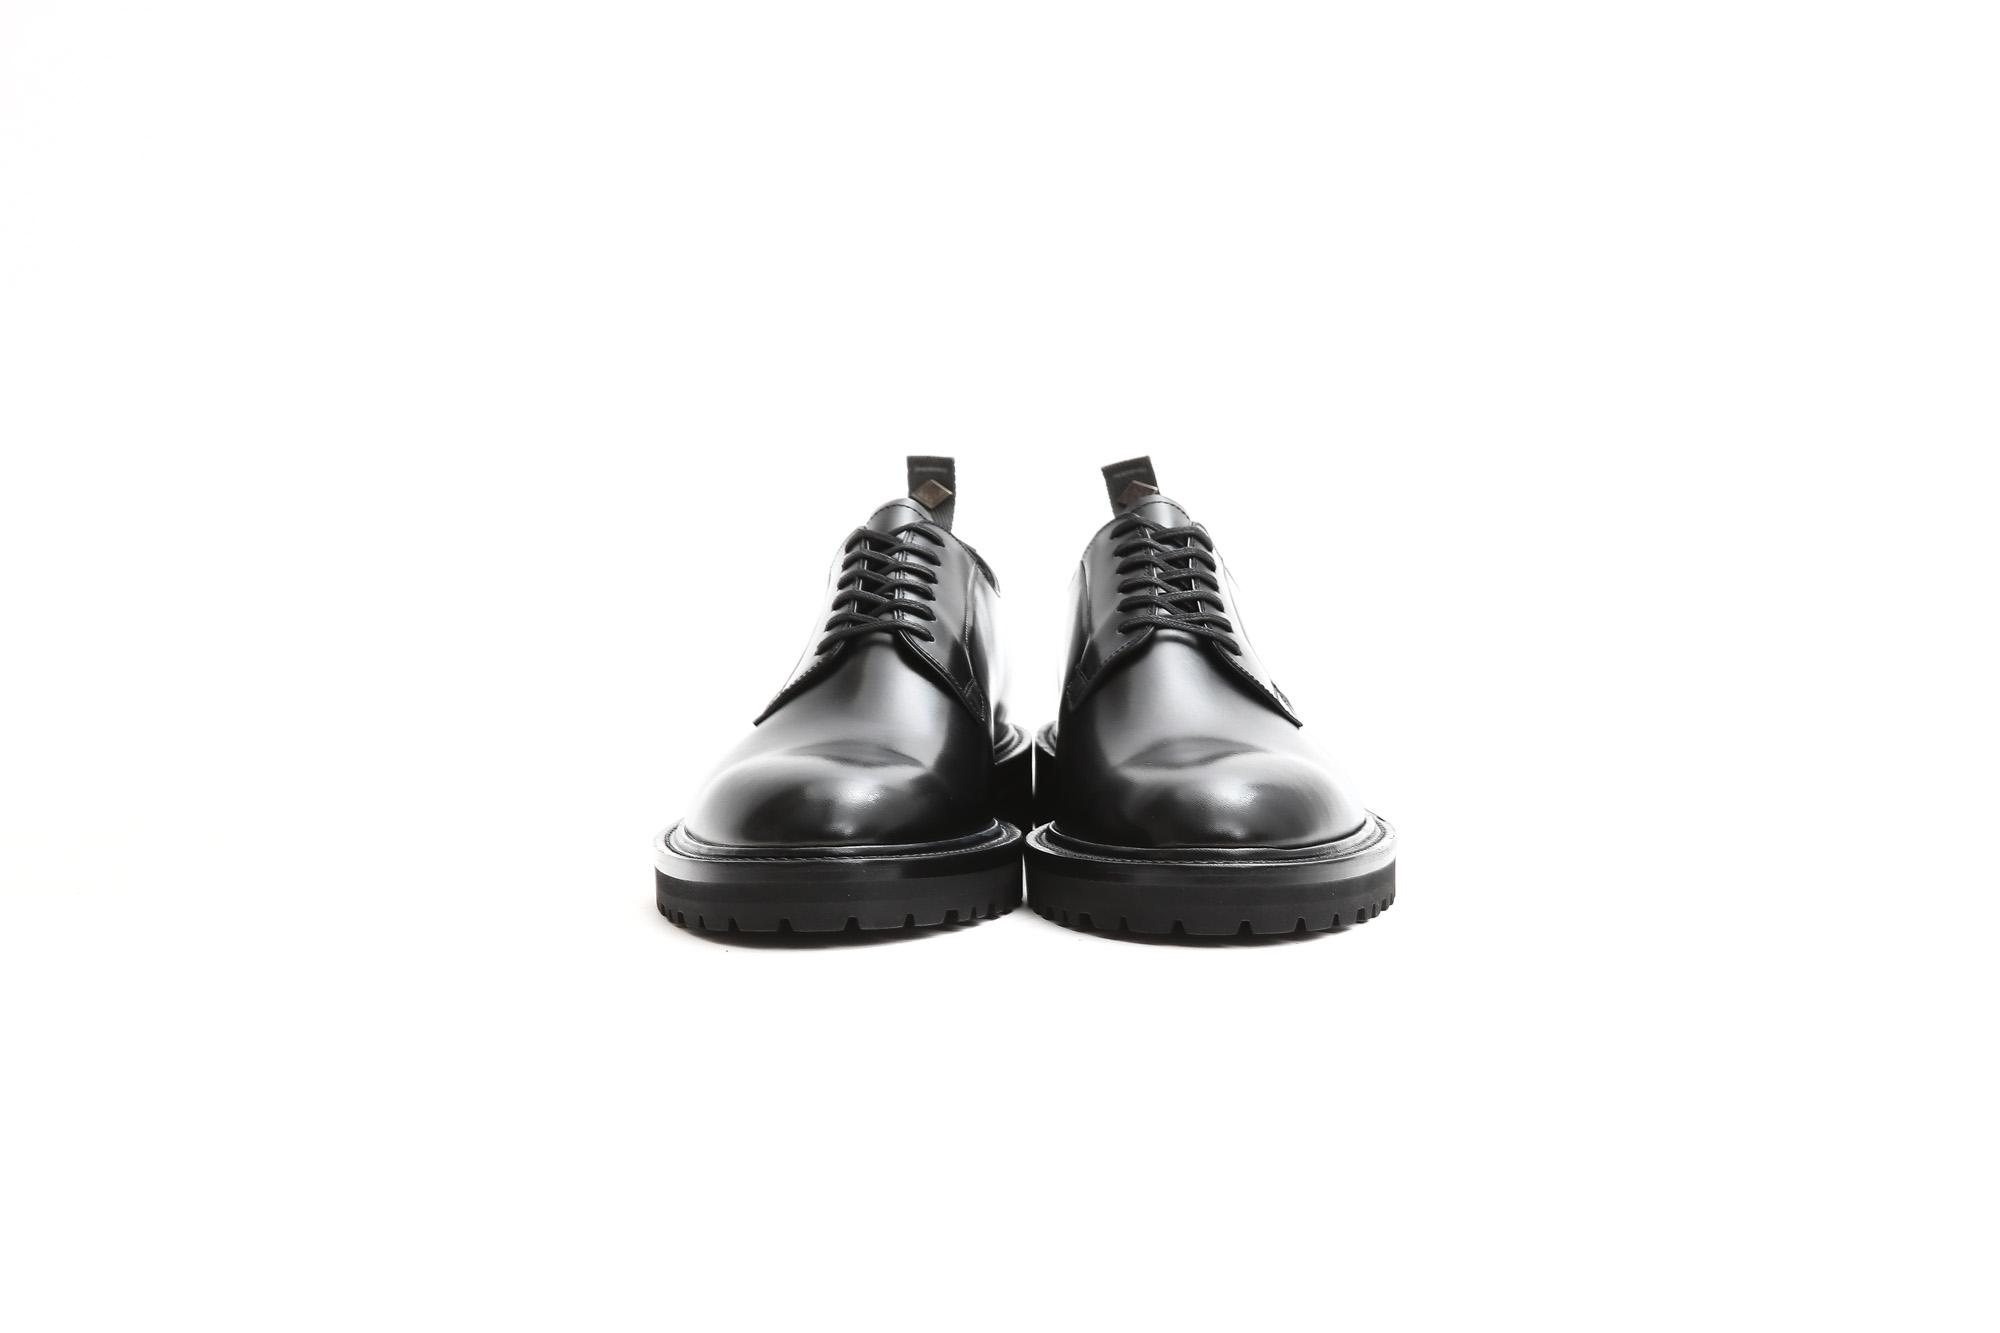 【WH / ダブルエイチ】 【WH-0001(WHS-0001)】 Plane Toe Shoes (干場氏 スペシャル モデル) Cruise Last (クルーズラスト) ANNONAY Vocalou Calf Leather プレーントゥシューズ BLACK (ブラック) MADE IN JAPAN(日本製) 2018 春夏新作   【干場氏、坪内氏の直筆サイン入り】【Alto e Diritto限定 スペシャルアイテム】 wh 干場さん 干場スペシャル FORZASTYLE フォルザスタイル 愛知 名古屋 Alto e Diritto アルト エ デリット